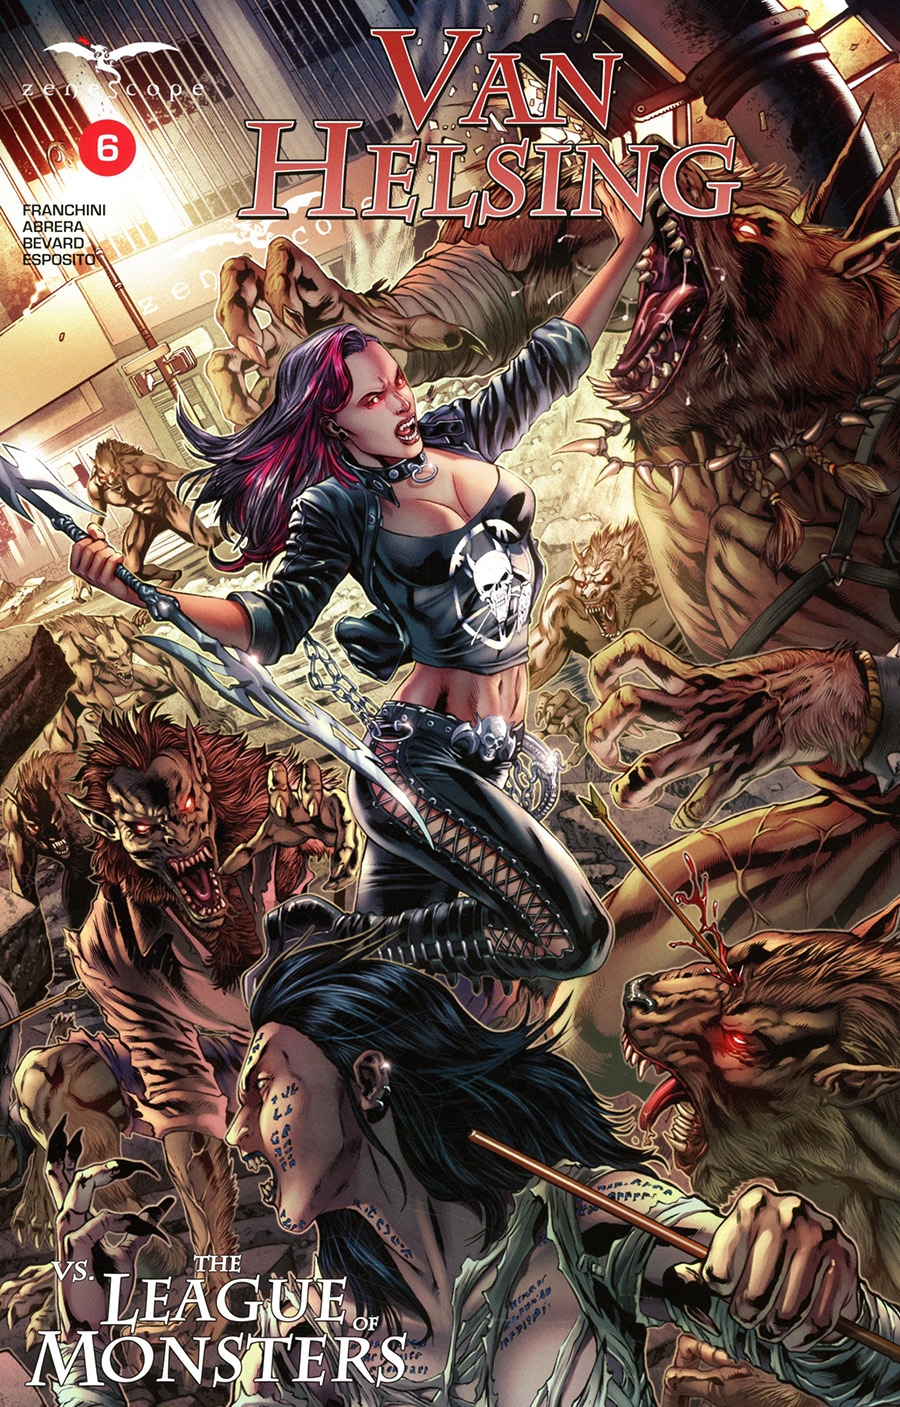 Grimm Fairy Tales Presents Van Helsing vs The League Of Monsters #6 Cover B Igor Vitorino